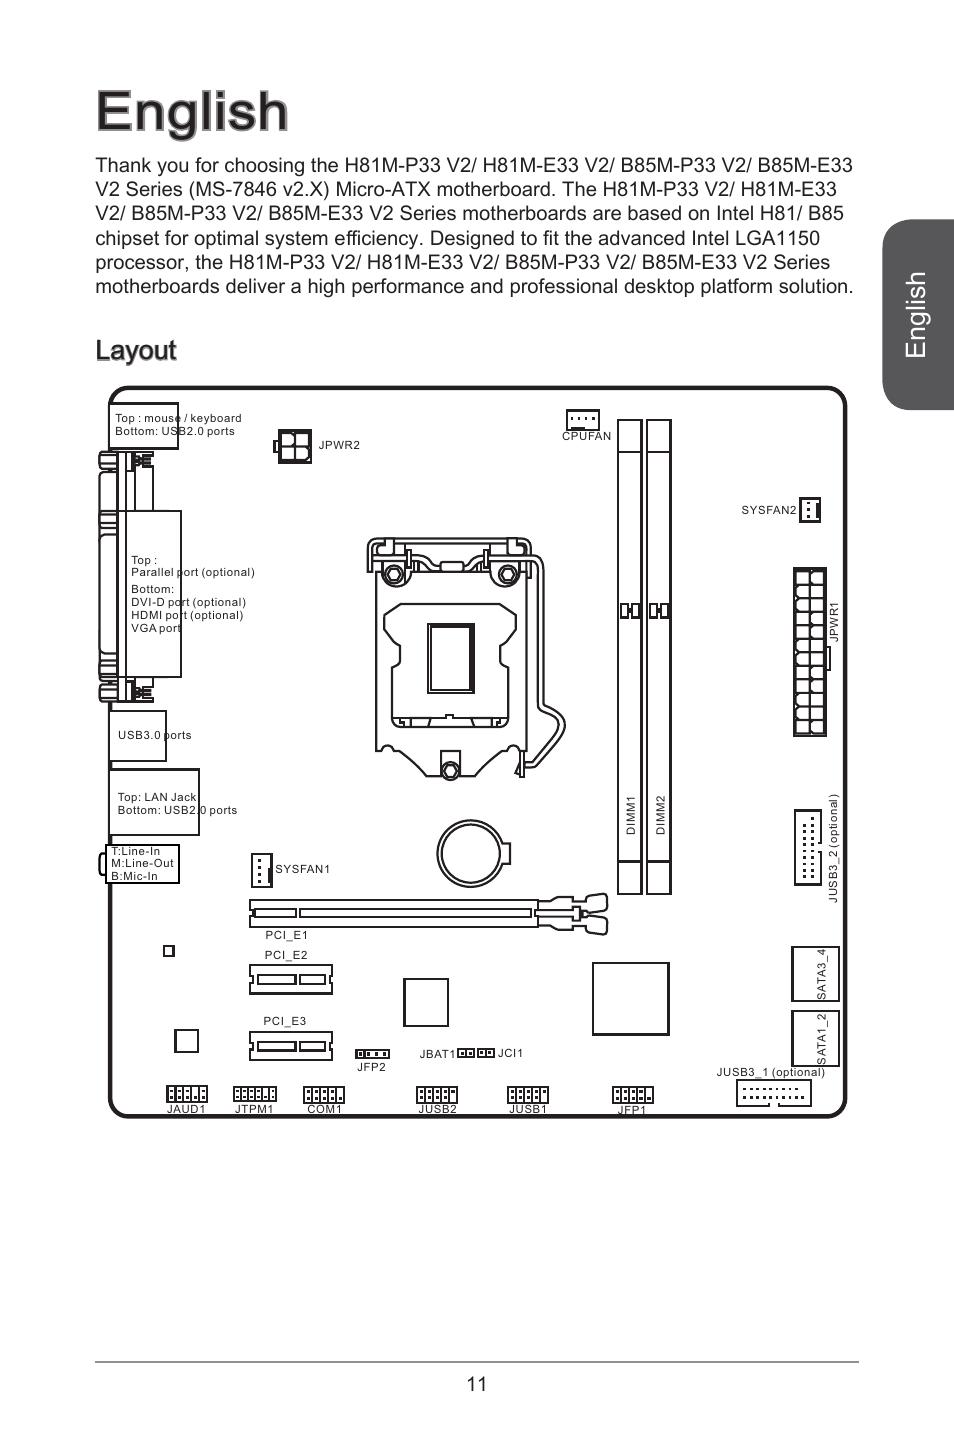 msi h81m e33 v2 page11 english, layout msi h81m e33 v2 user manual page 11 182  at alyssarenee.co